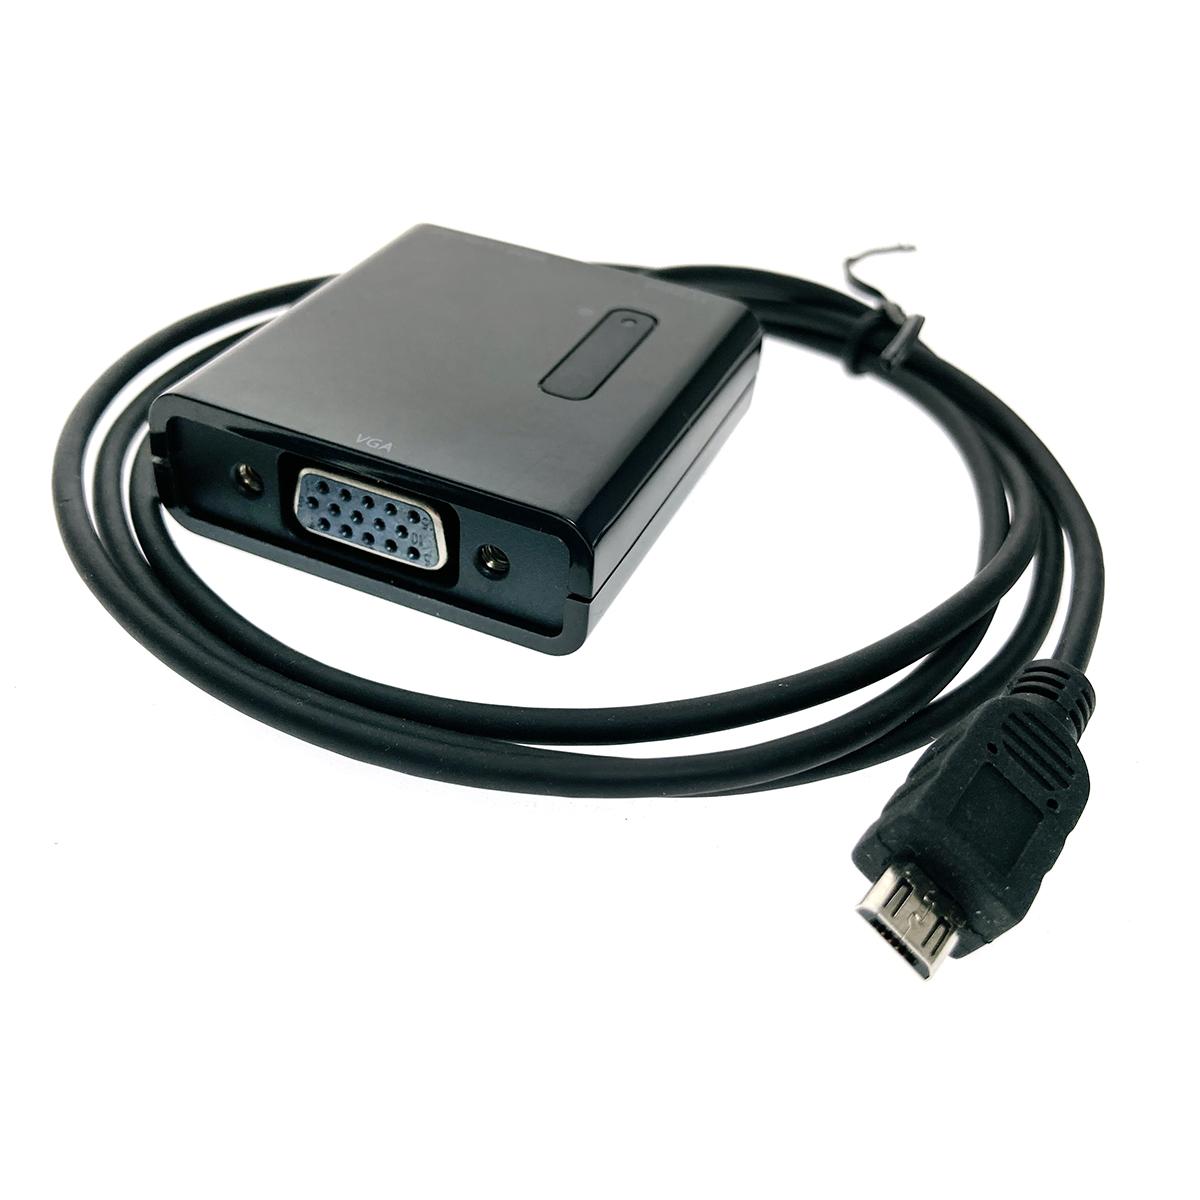 MHL-кабель micro USB B male to VGA female with Analog/Digital Audio SPDIF